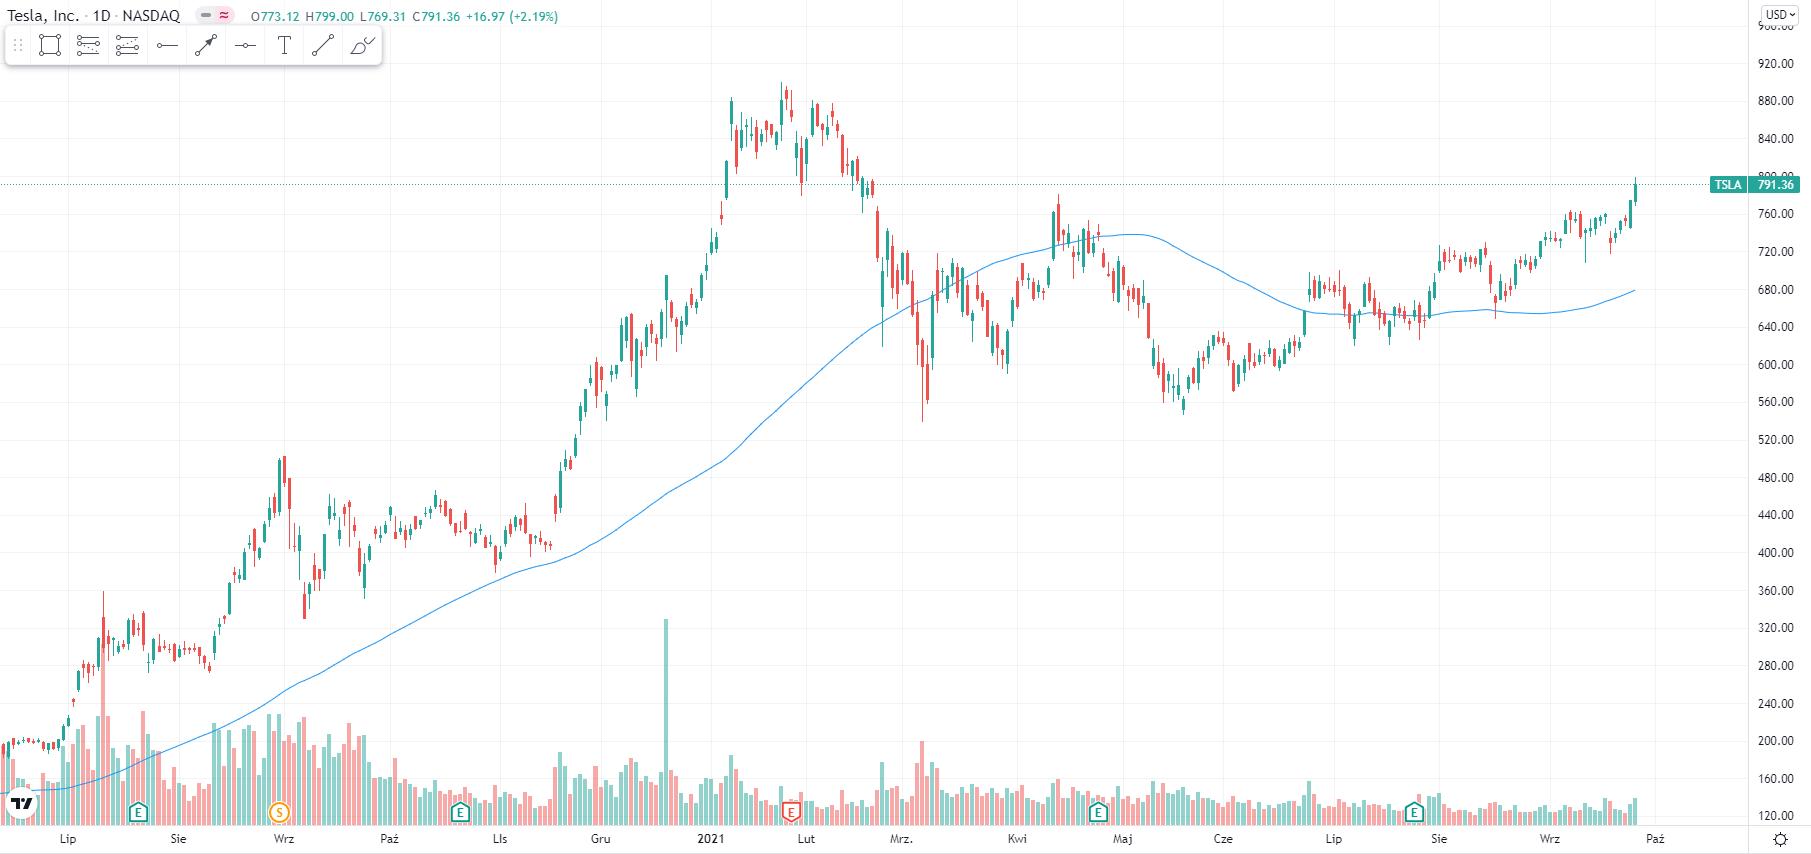 wykres Kurs akcji Tesla D1 28.09.2021